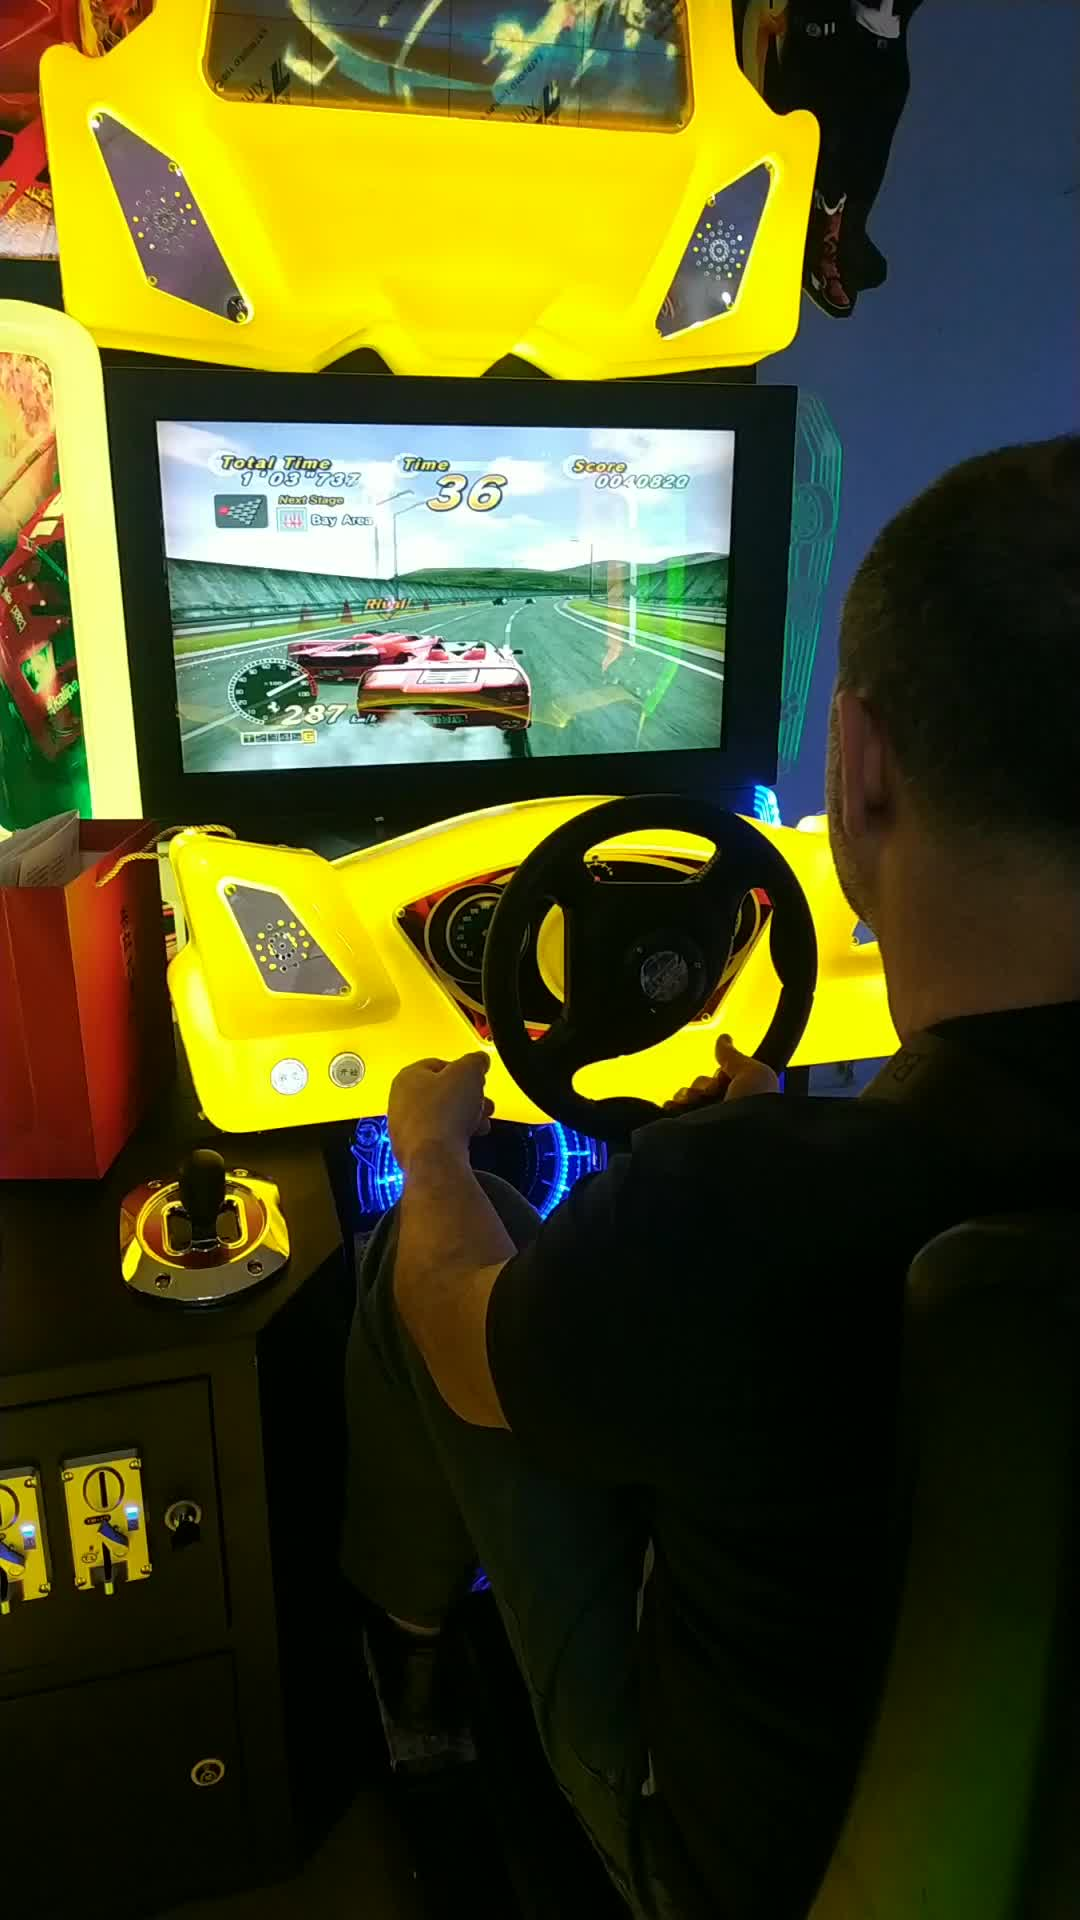 Luxury ที่นั่งคู่ผู้ใหญ่อาเขต outrun ความเร็ว drift จำลองรถแข่งเกมเครื่อง